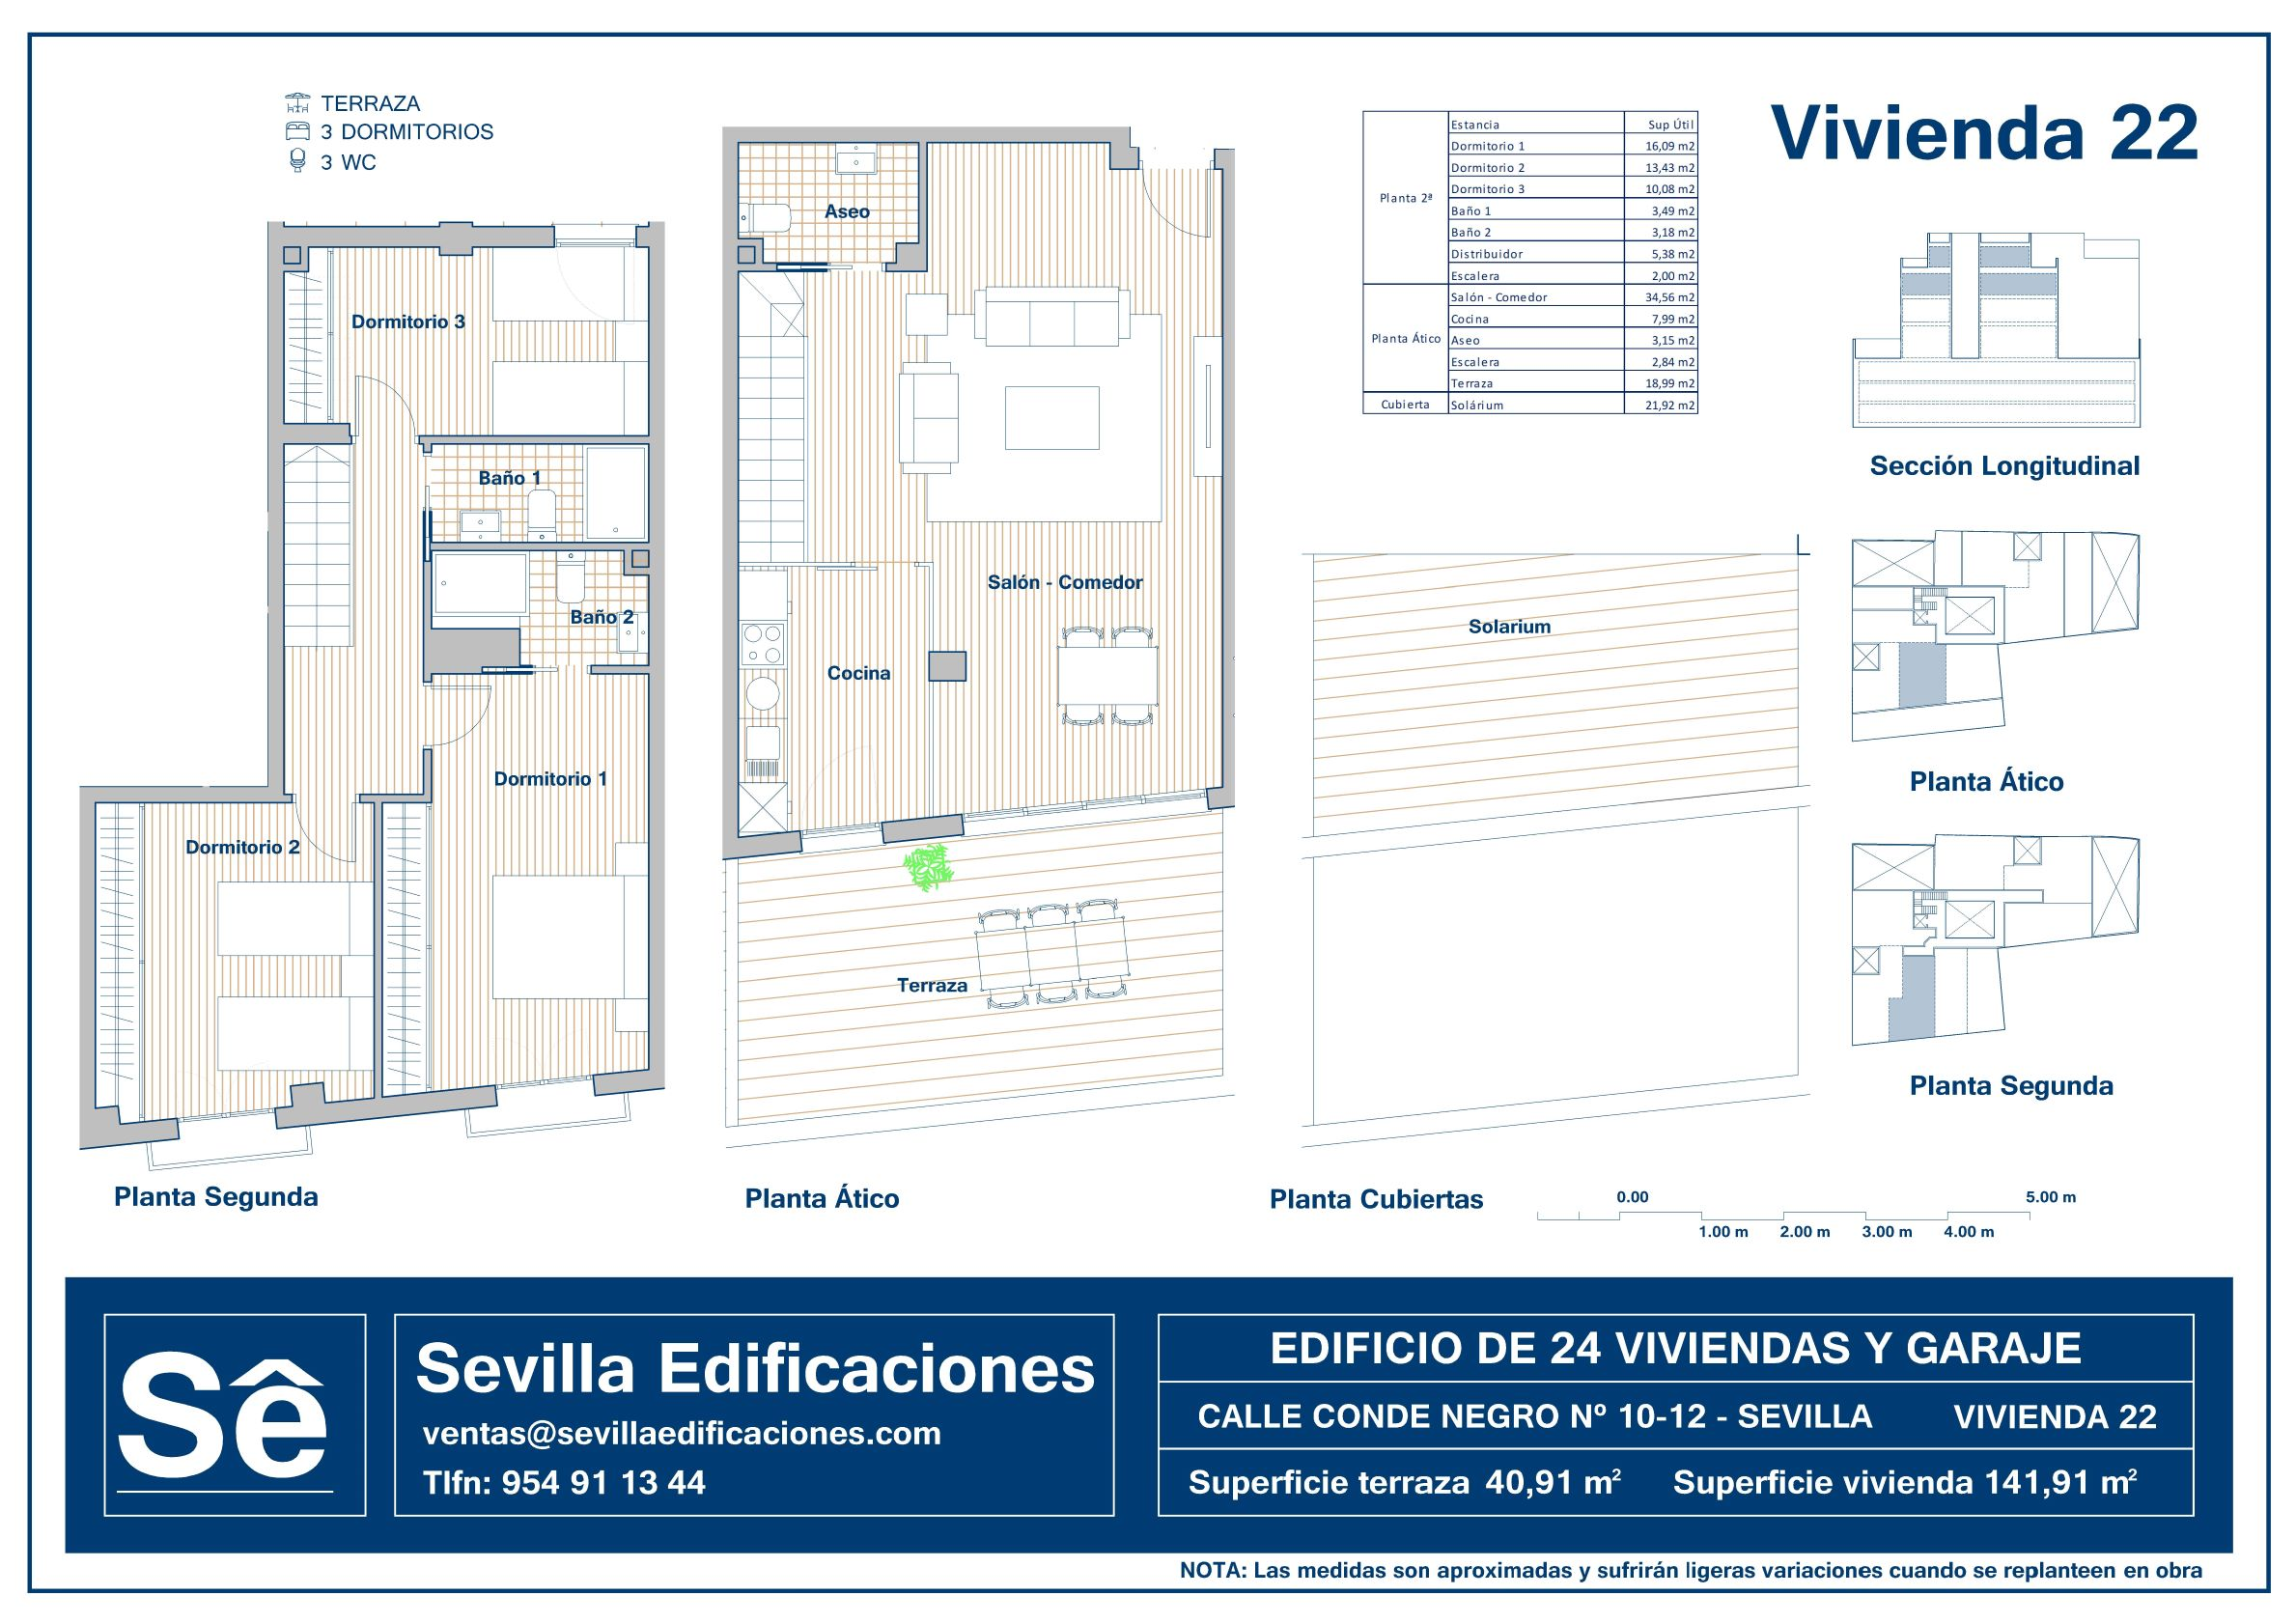 CONDENEGRO_VIVIENDA_22